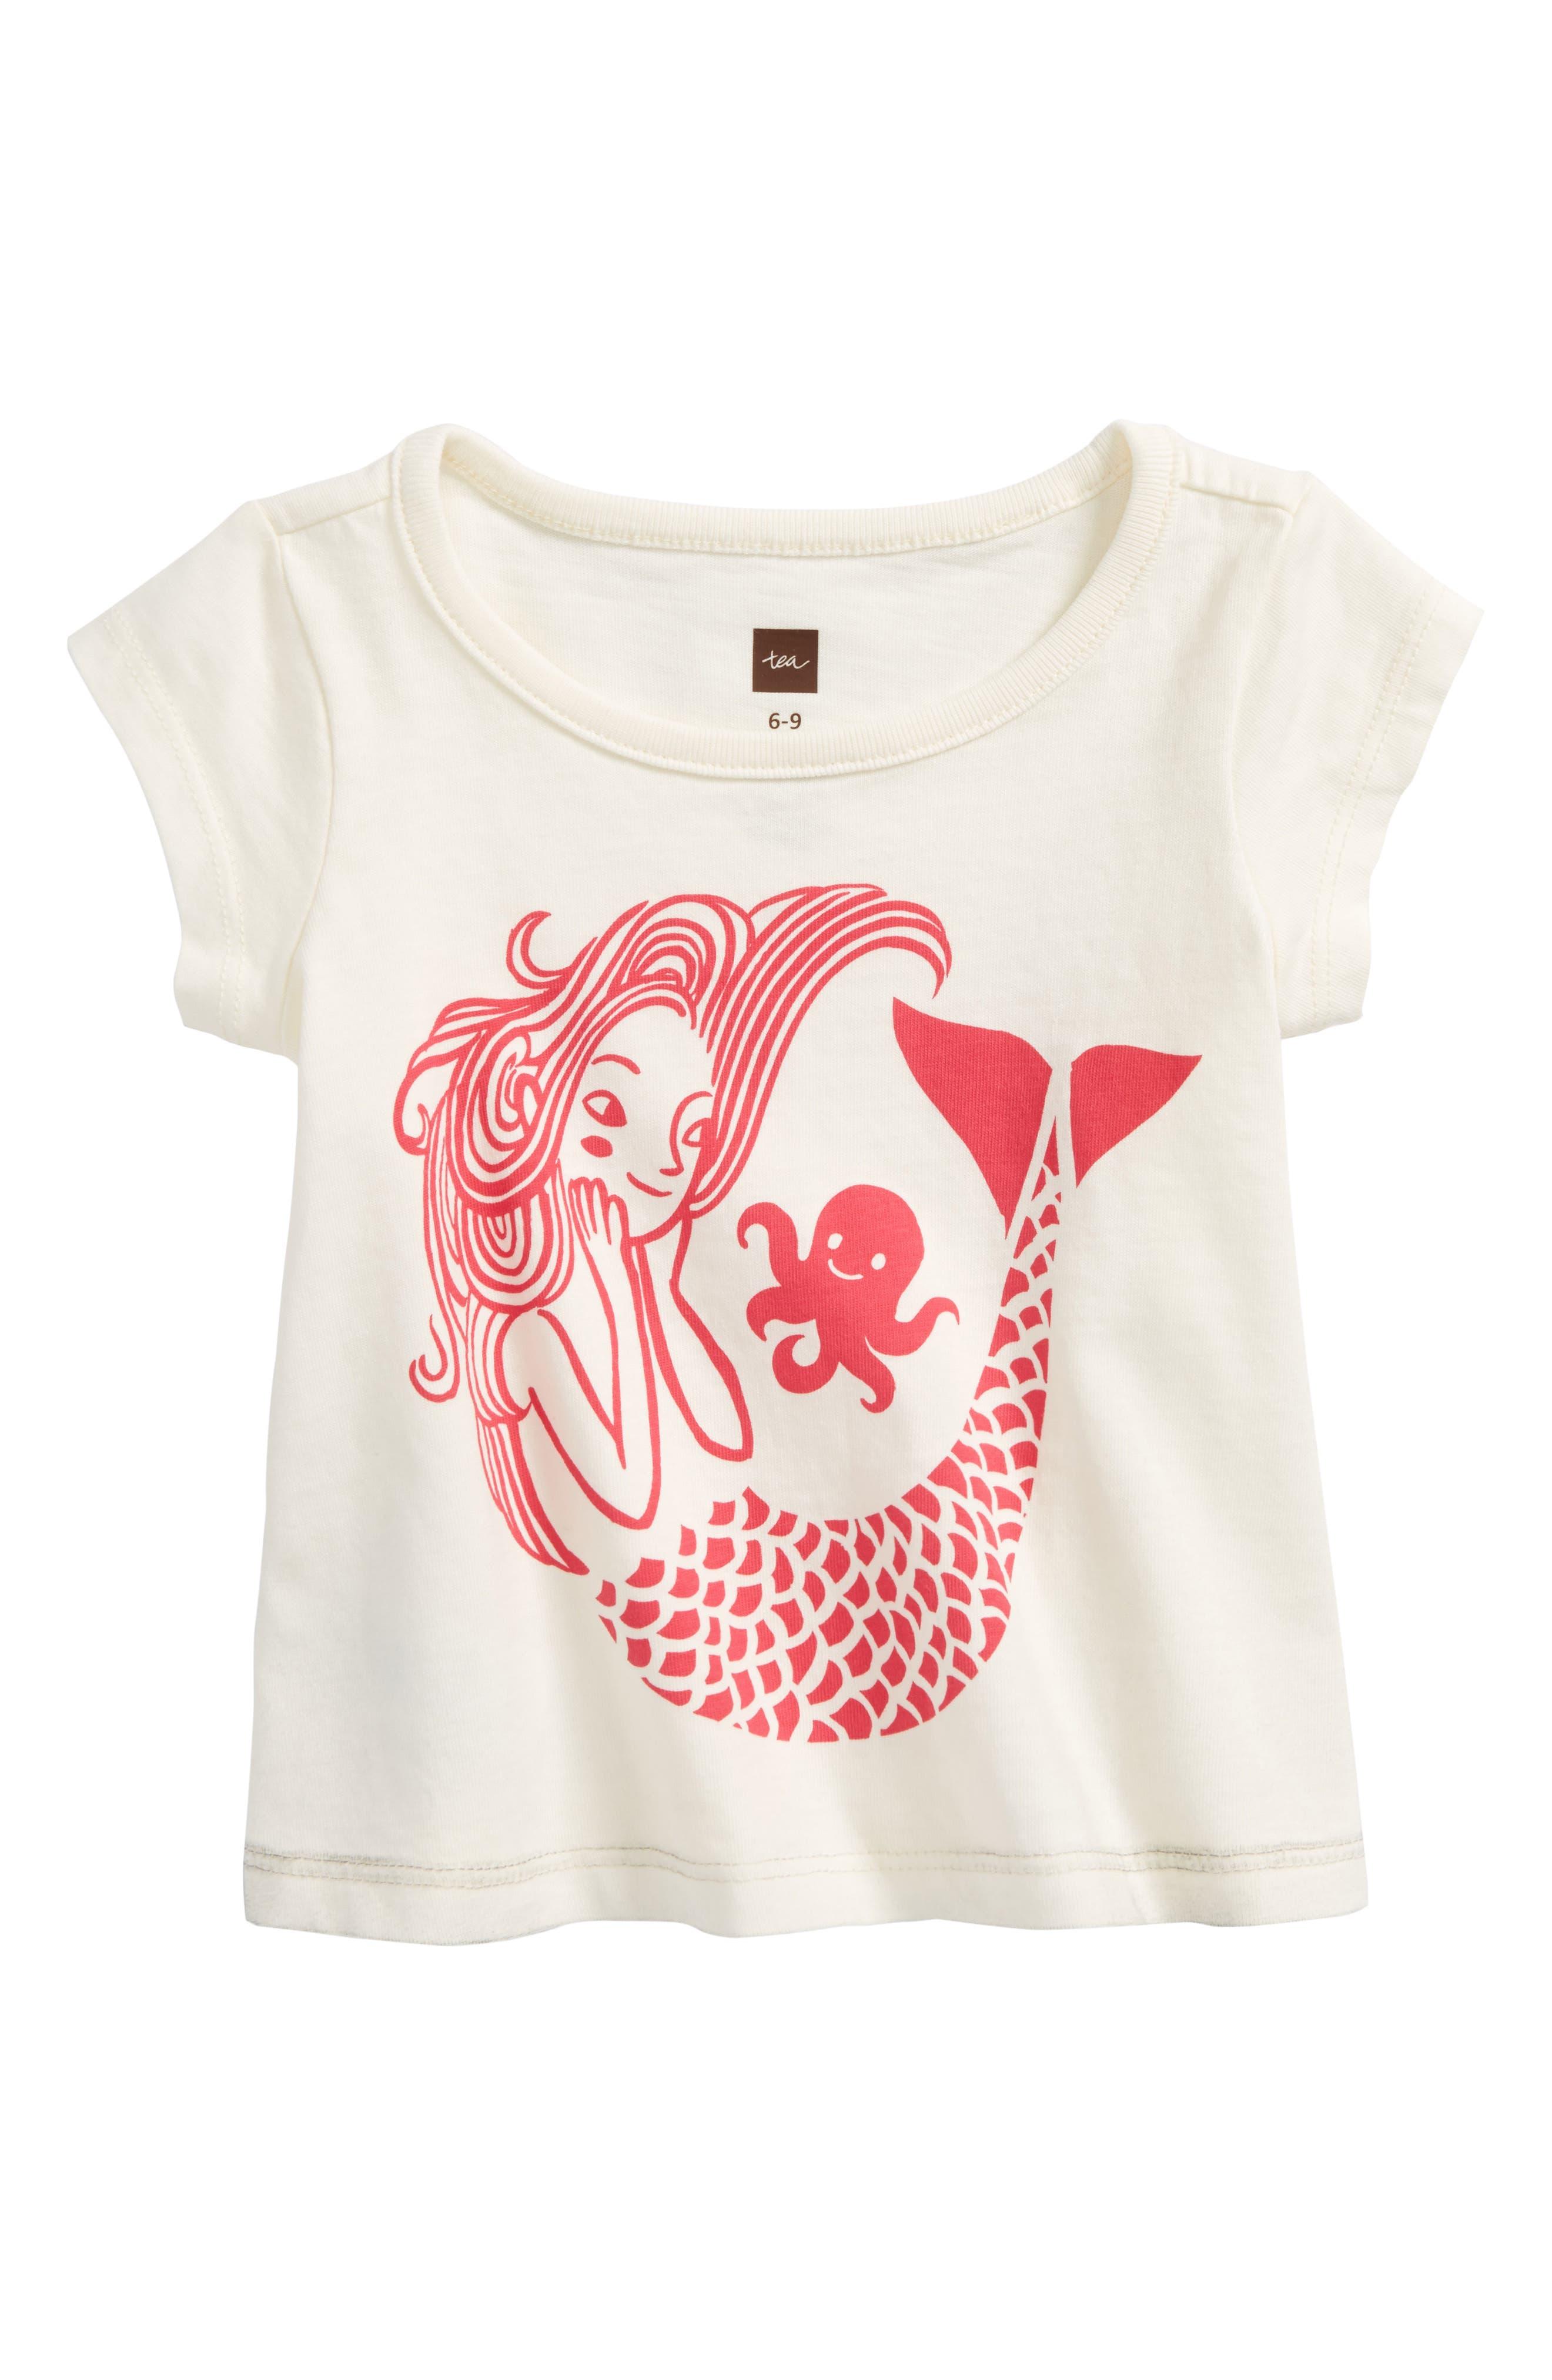 Mermaid Graphic Tee,                             Main thumbnail 1, color,                             Chalk